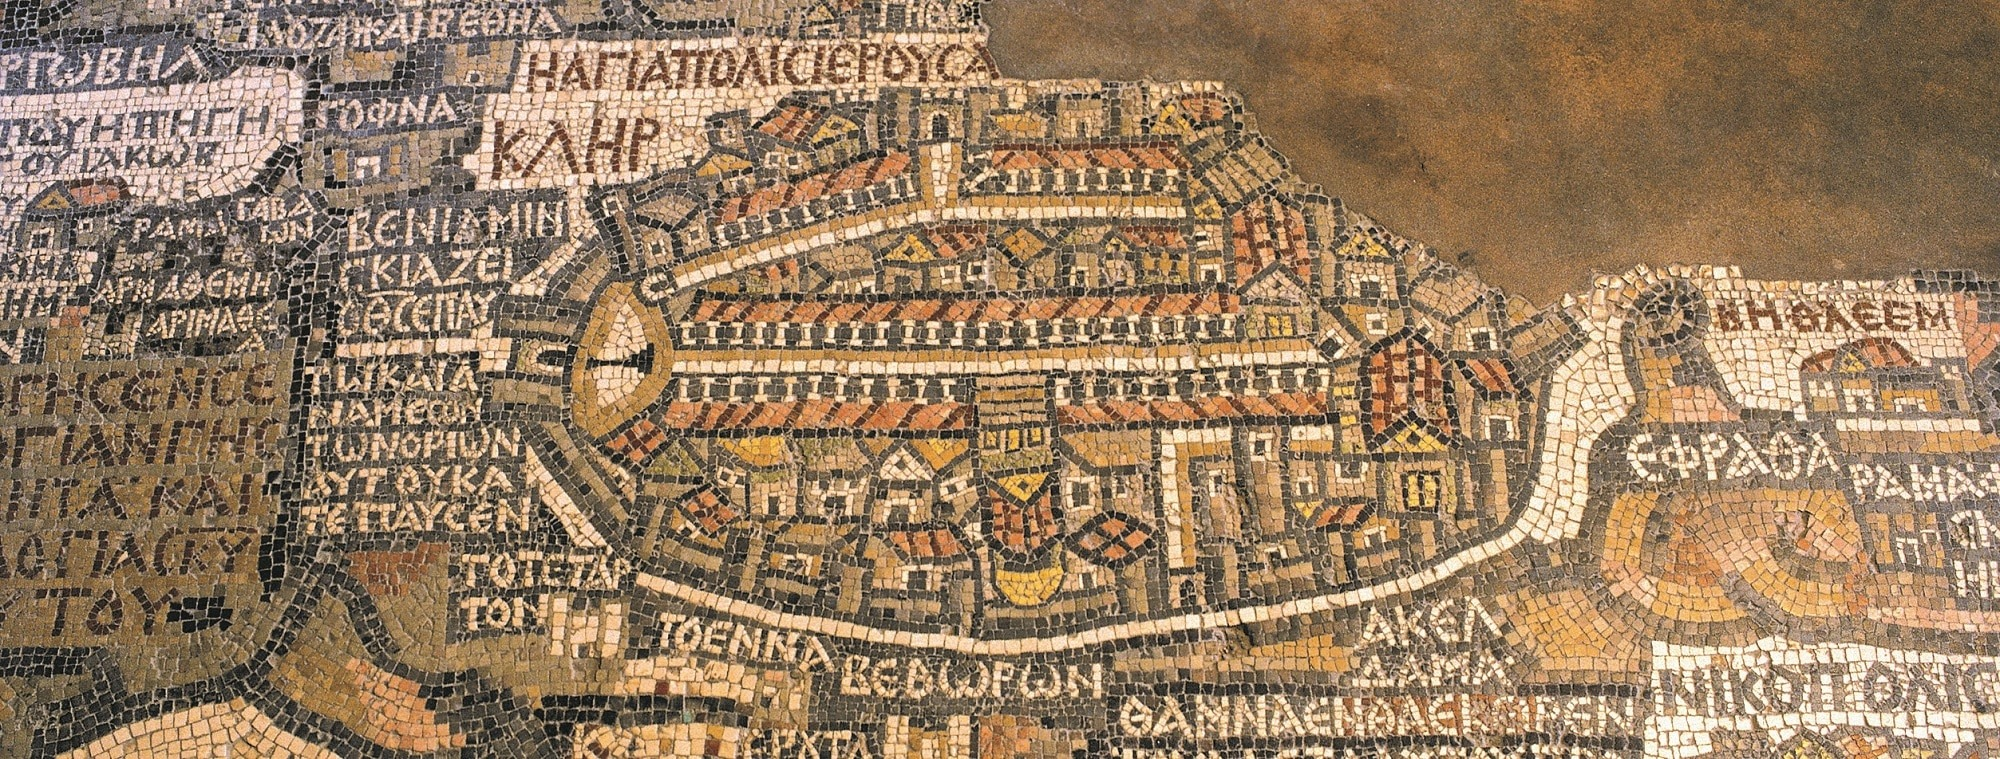 Amman, Madaba, Mount Nebo & Petra - Experience Jordan on vienna genesis, macedonian renaissance, late antique and medieval mosaics in italy, joshua roll,